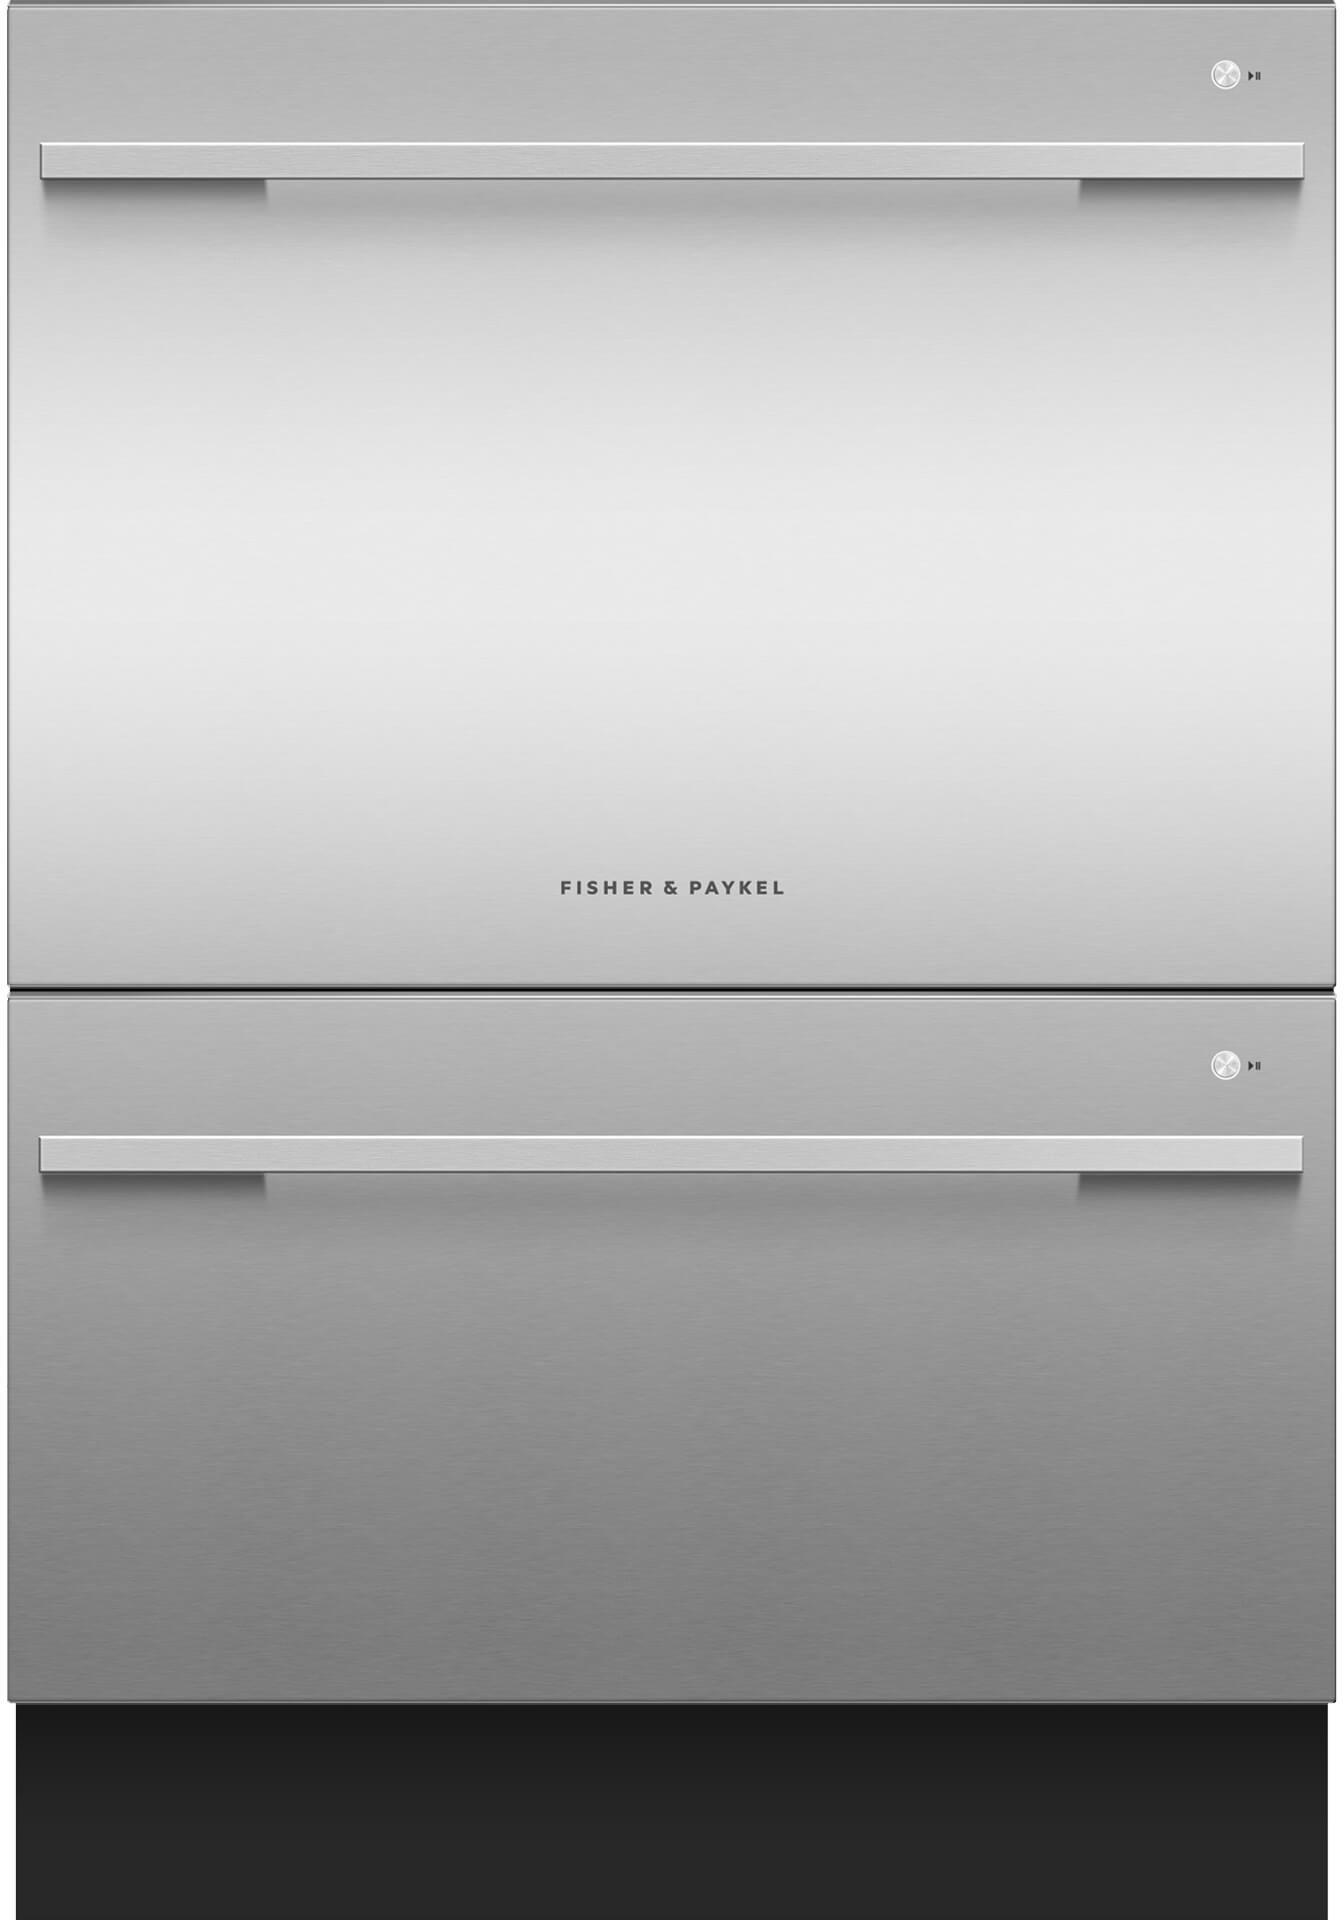 "Fisher Paykel DishDrawer™ 23.56"" Double Dishwasher-EZKleen Stainless  Steel-DD24DDFTX9 ..."